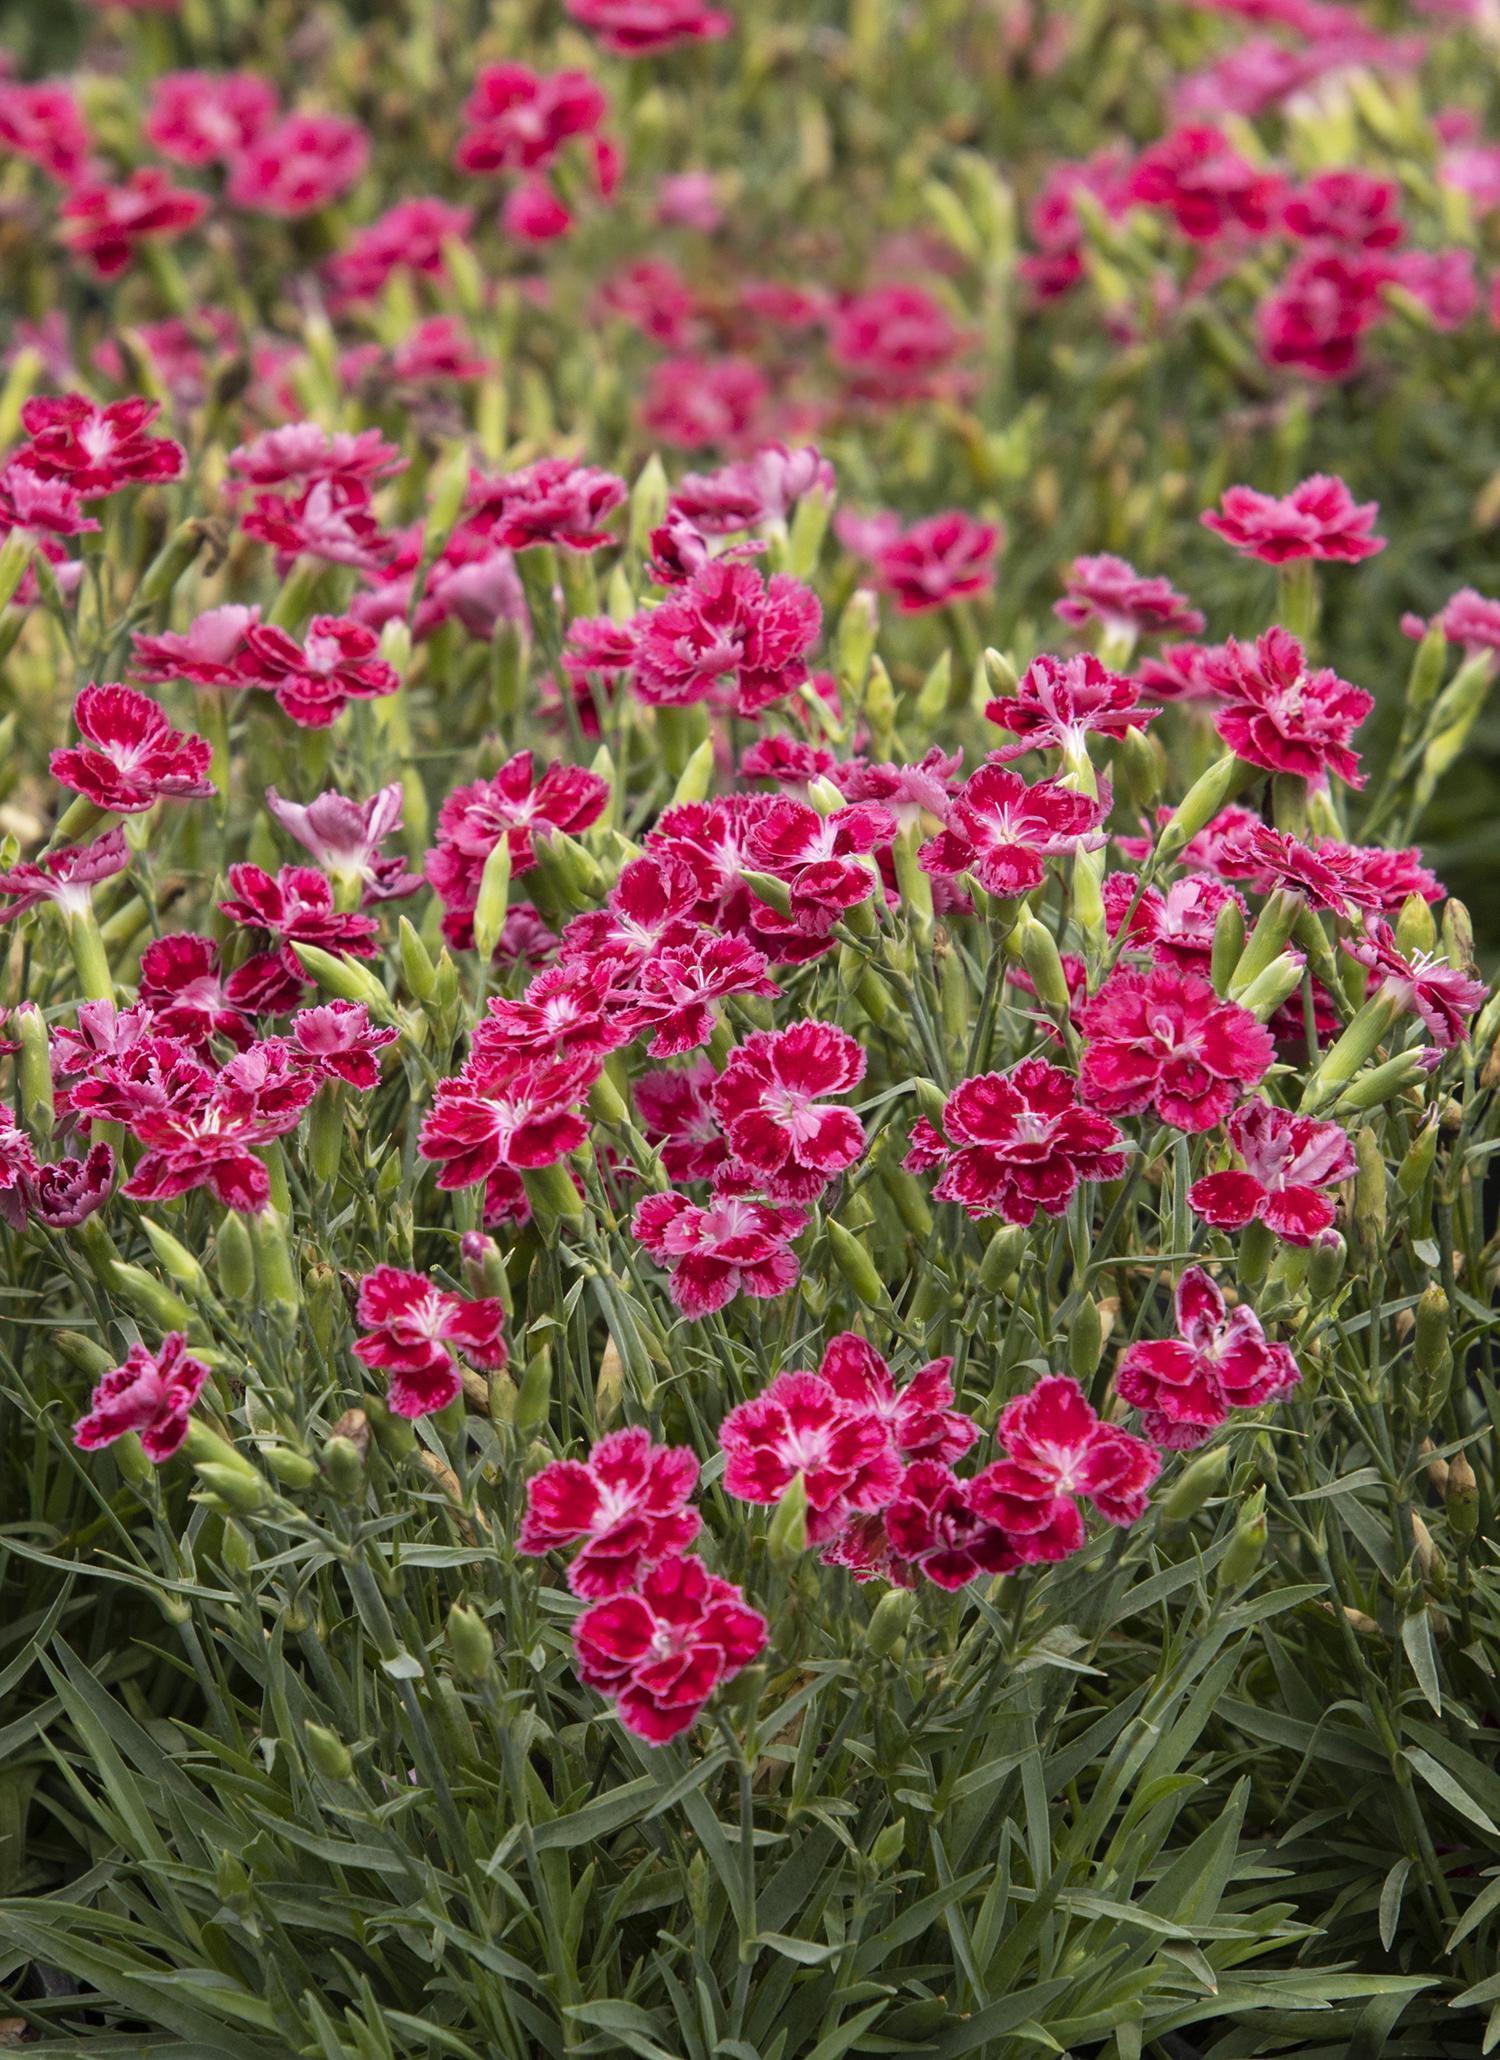 Delilah Magenta Dianthus Monrovia Delilah Magenta Dianthus